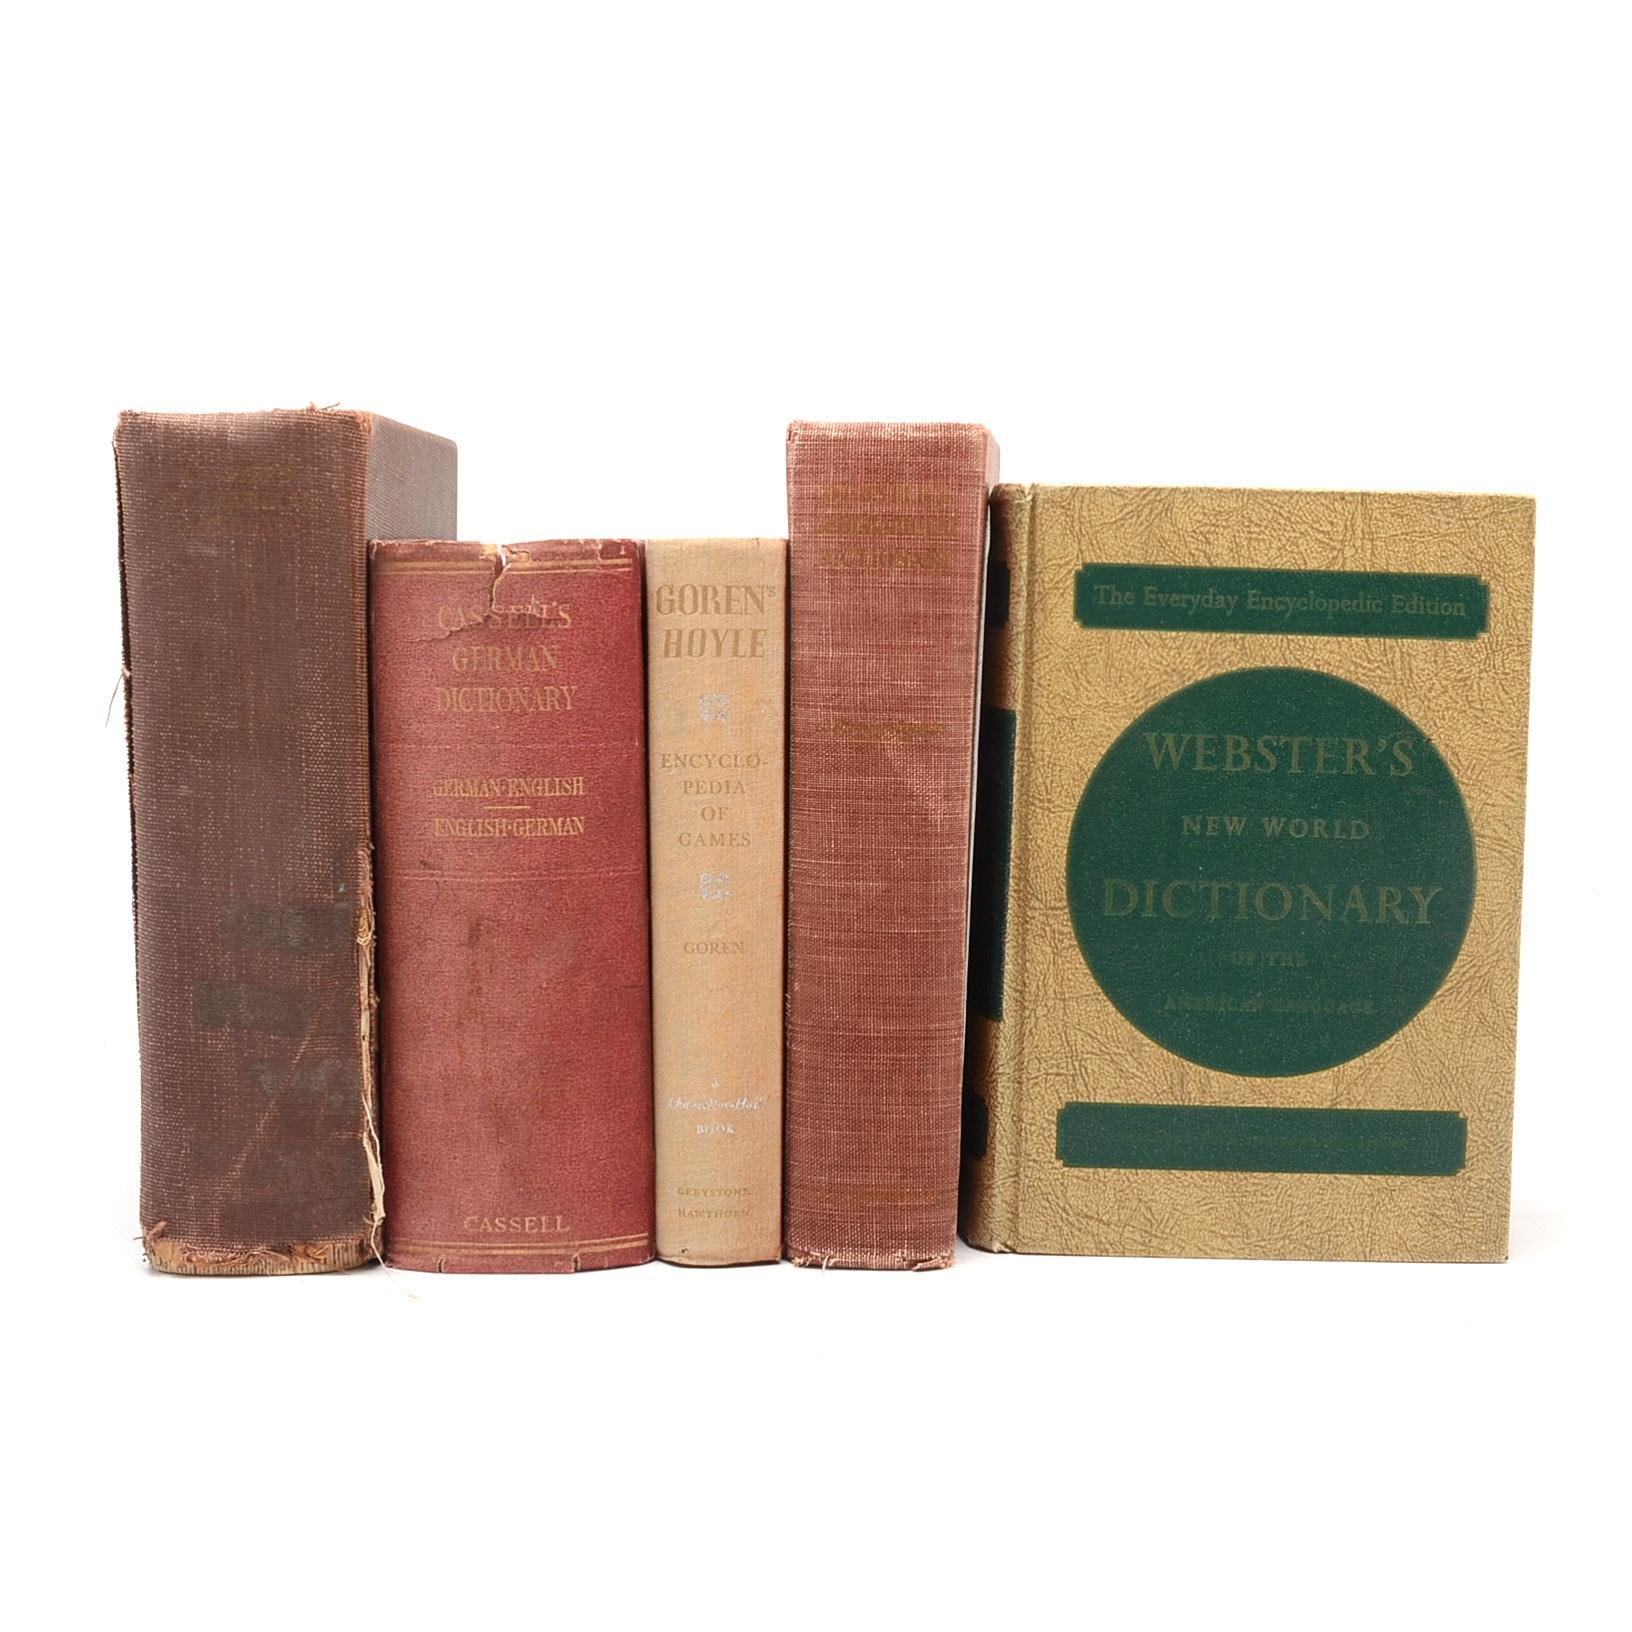 Vintage Dictionaries and Encyclopedias